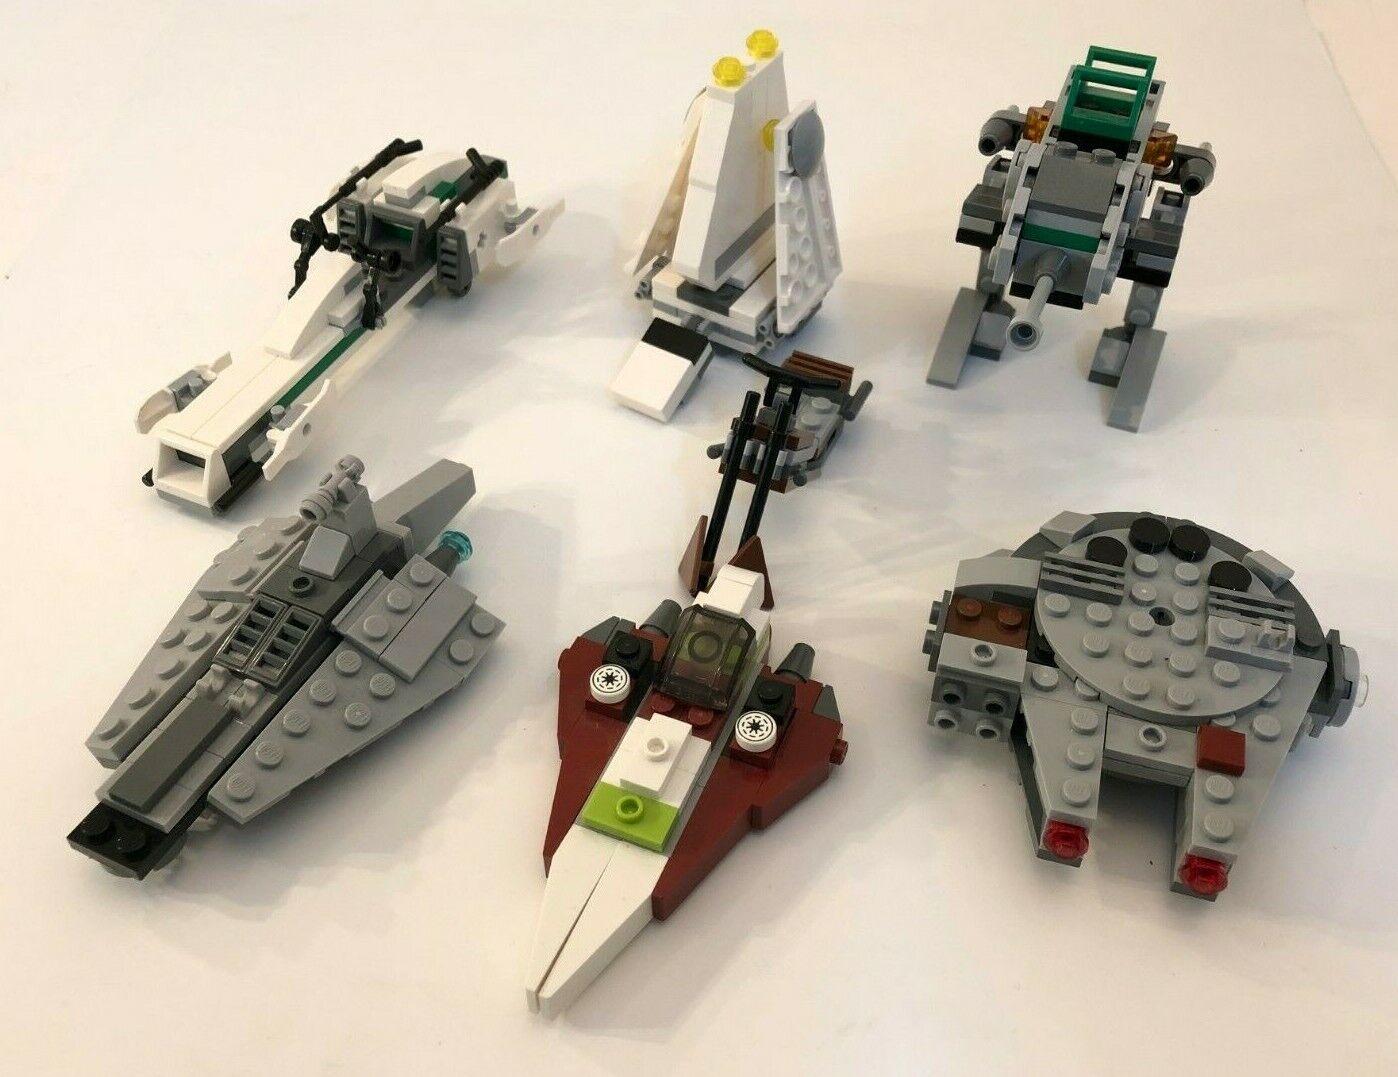 LEGO STAR WARS LOT OF 7 MINI MINI MINI VEHICLES MILLENNIUM FALCON AT-ST IMPERIAL SHUTTLE ed5d68